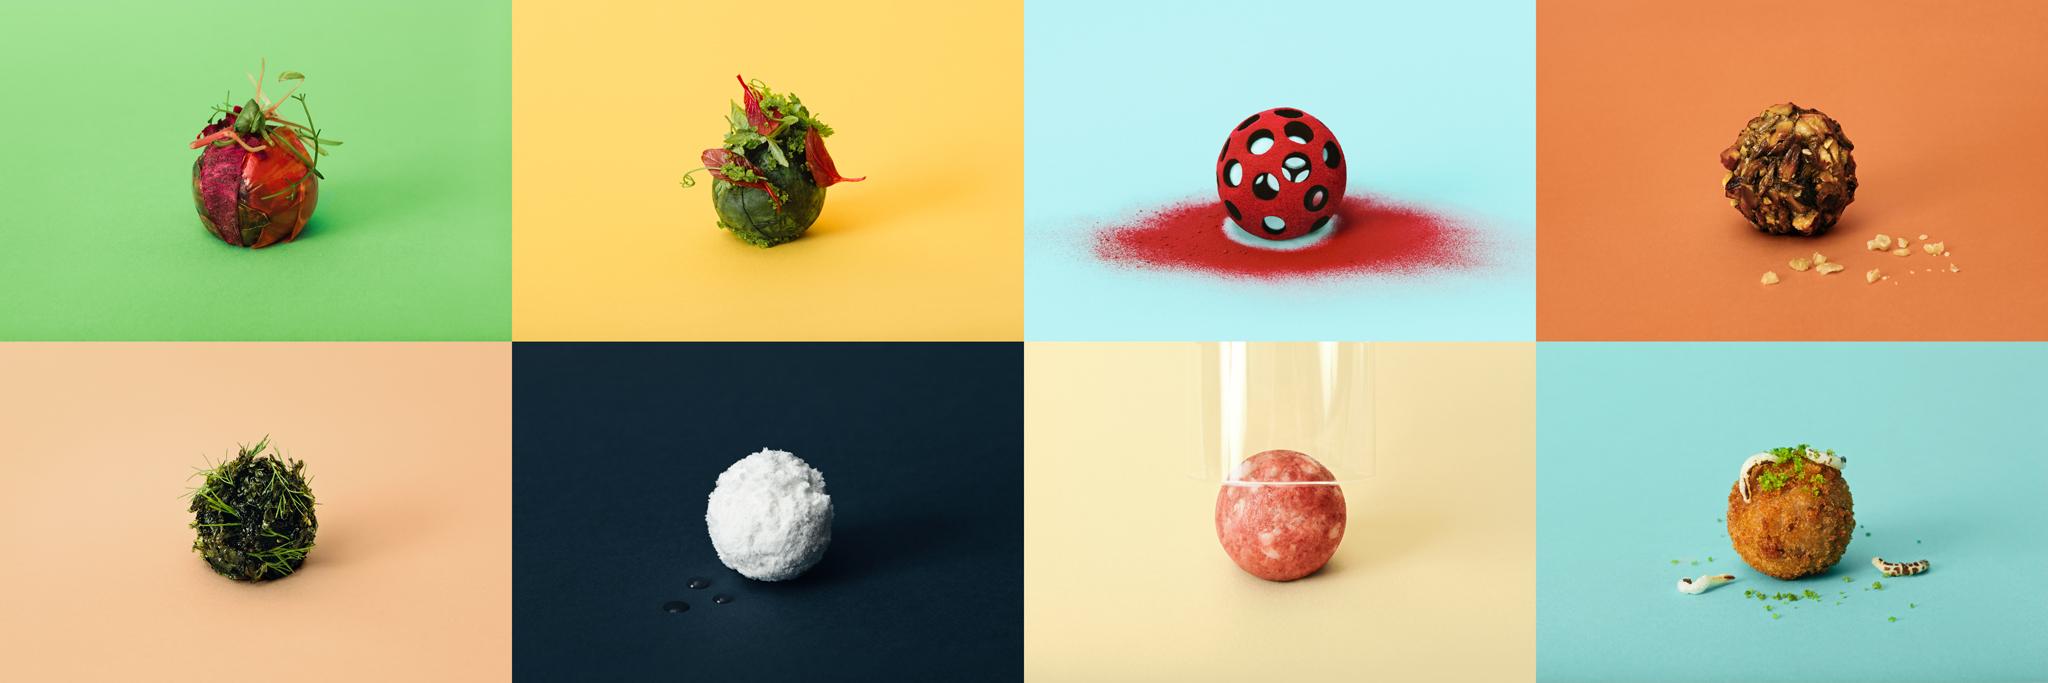 Tomorrows-Meatball-IKEA-Space10-all